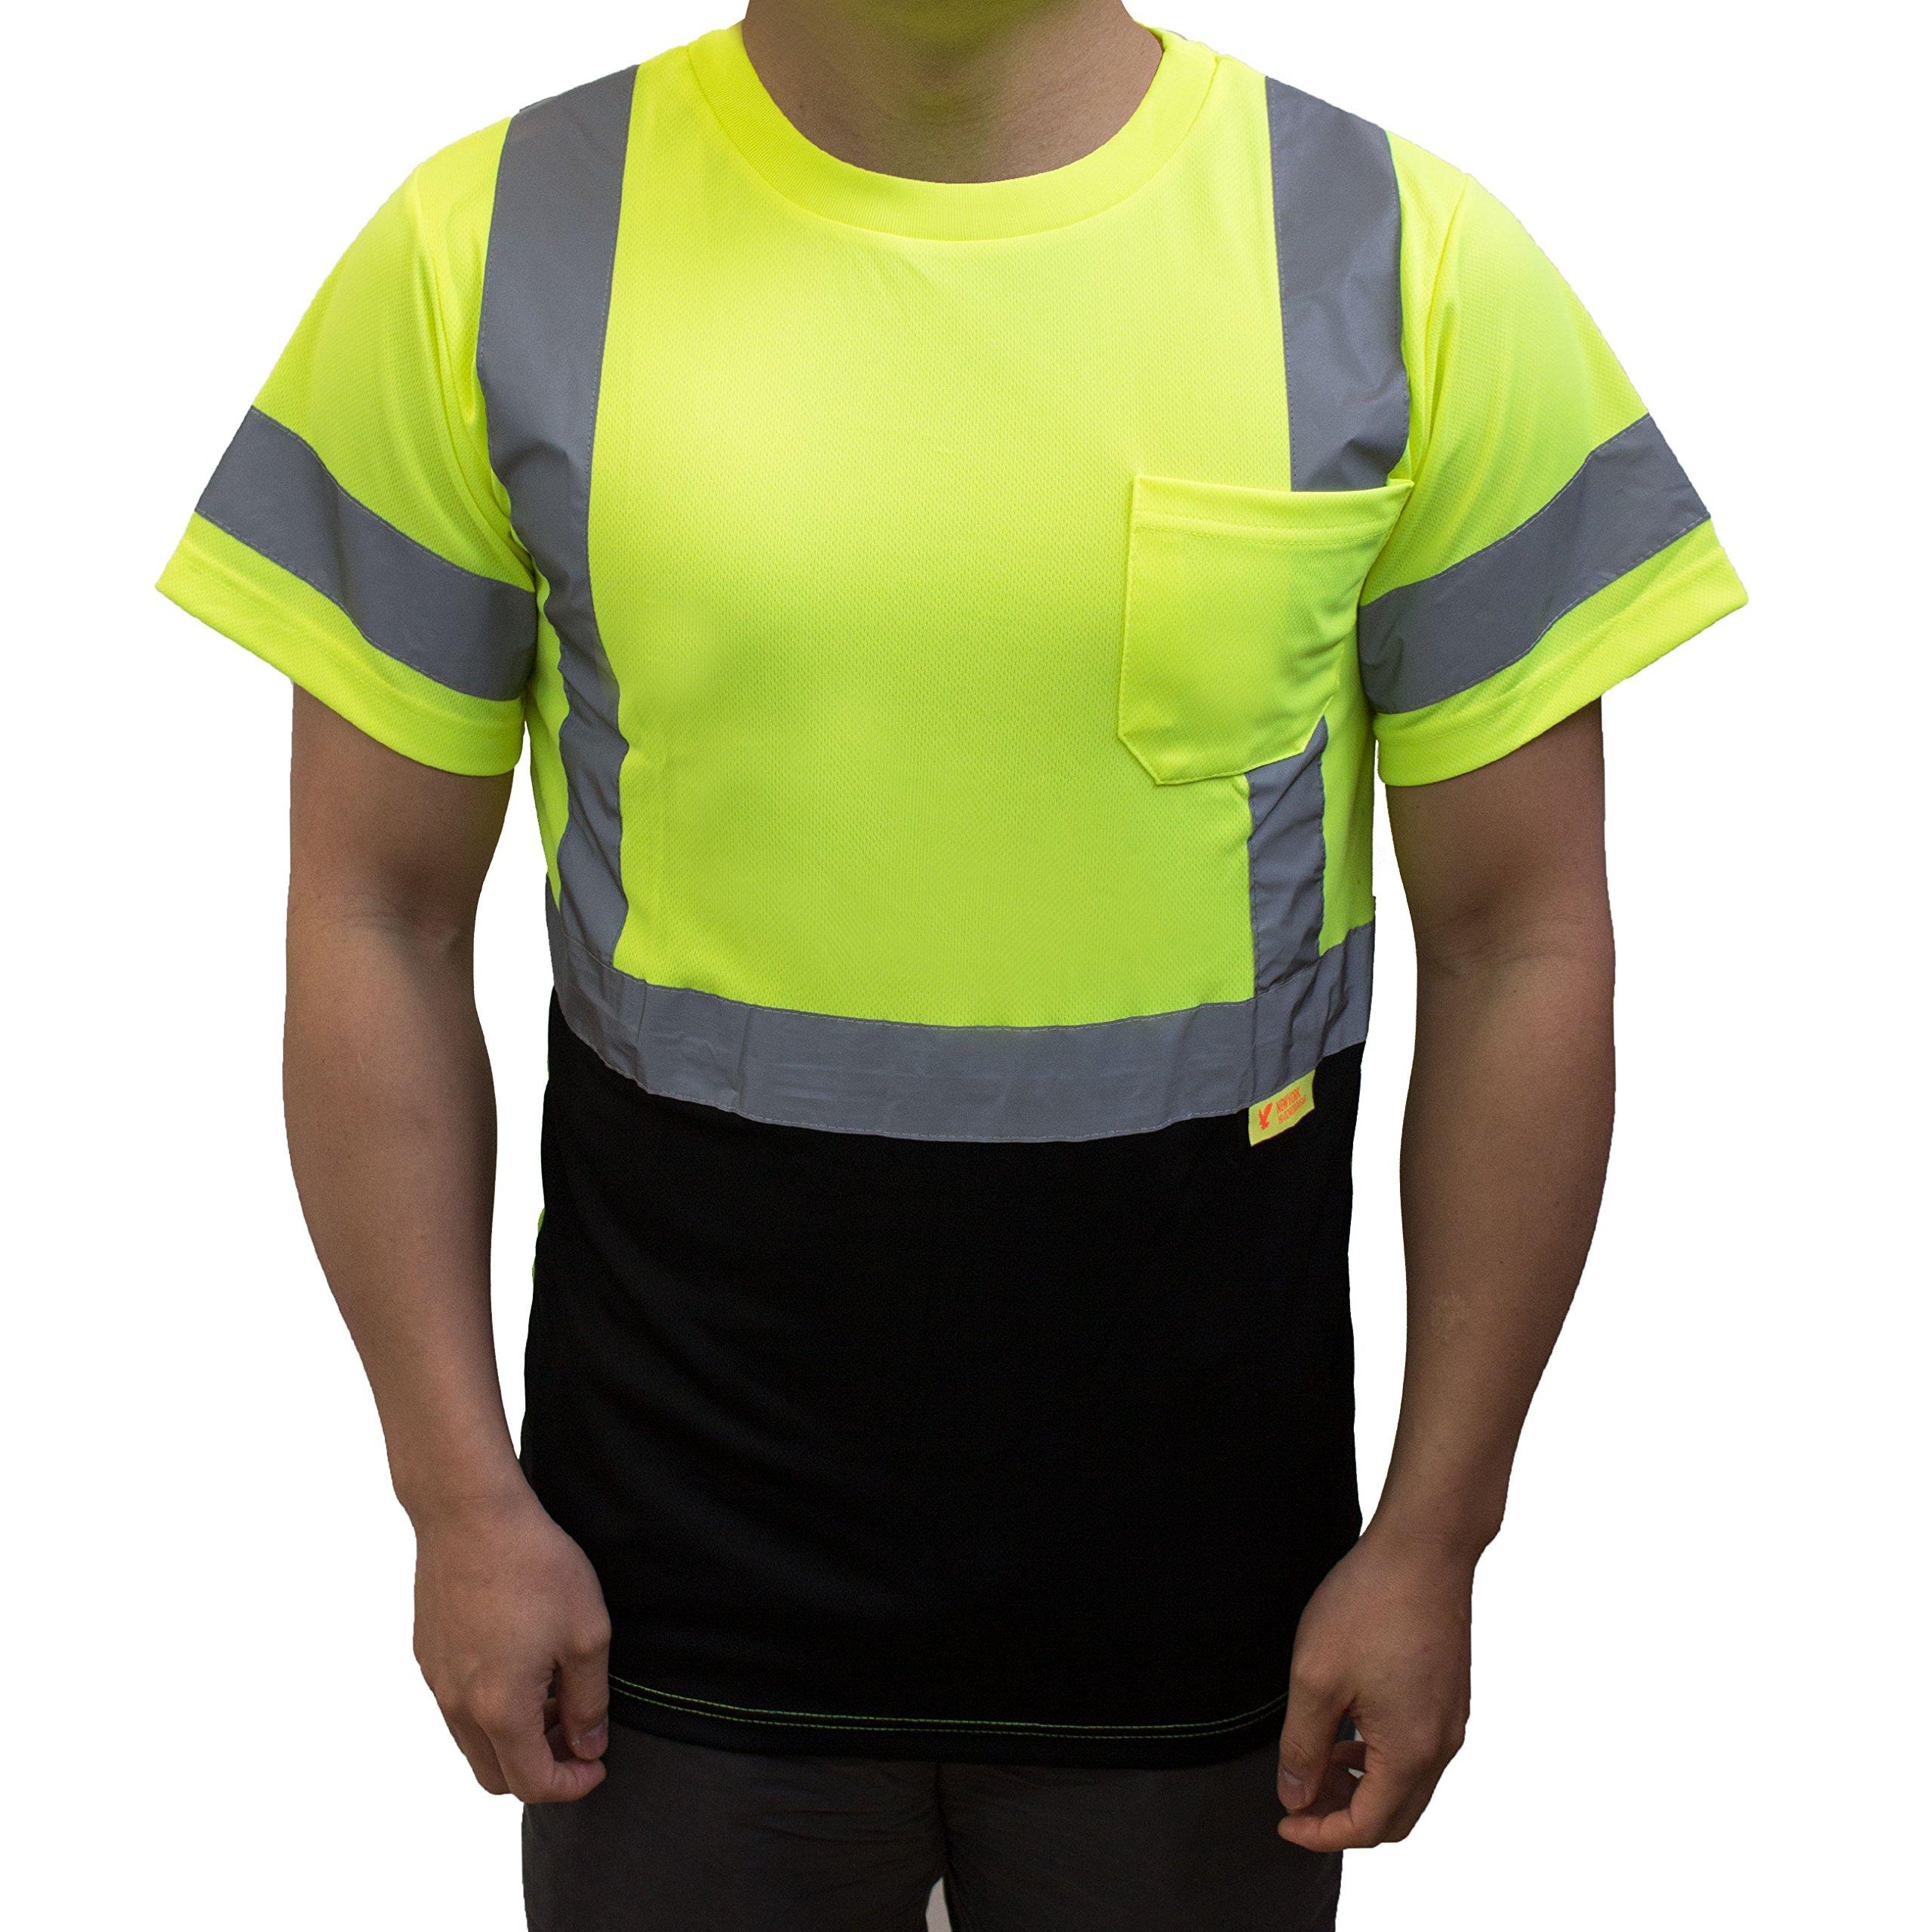 NY BFS8512 High-Visibility Class 3 T Shirt with Moisture Wicking Mesh Birdseye, Black Bottom (Large, Green) by New York Hi-Viz Workwear (Image #2)